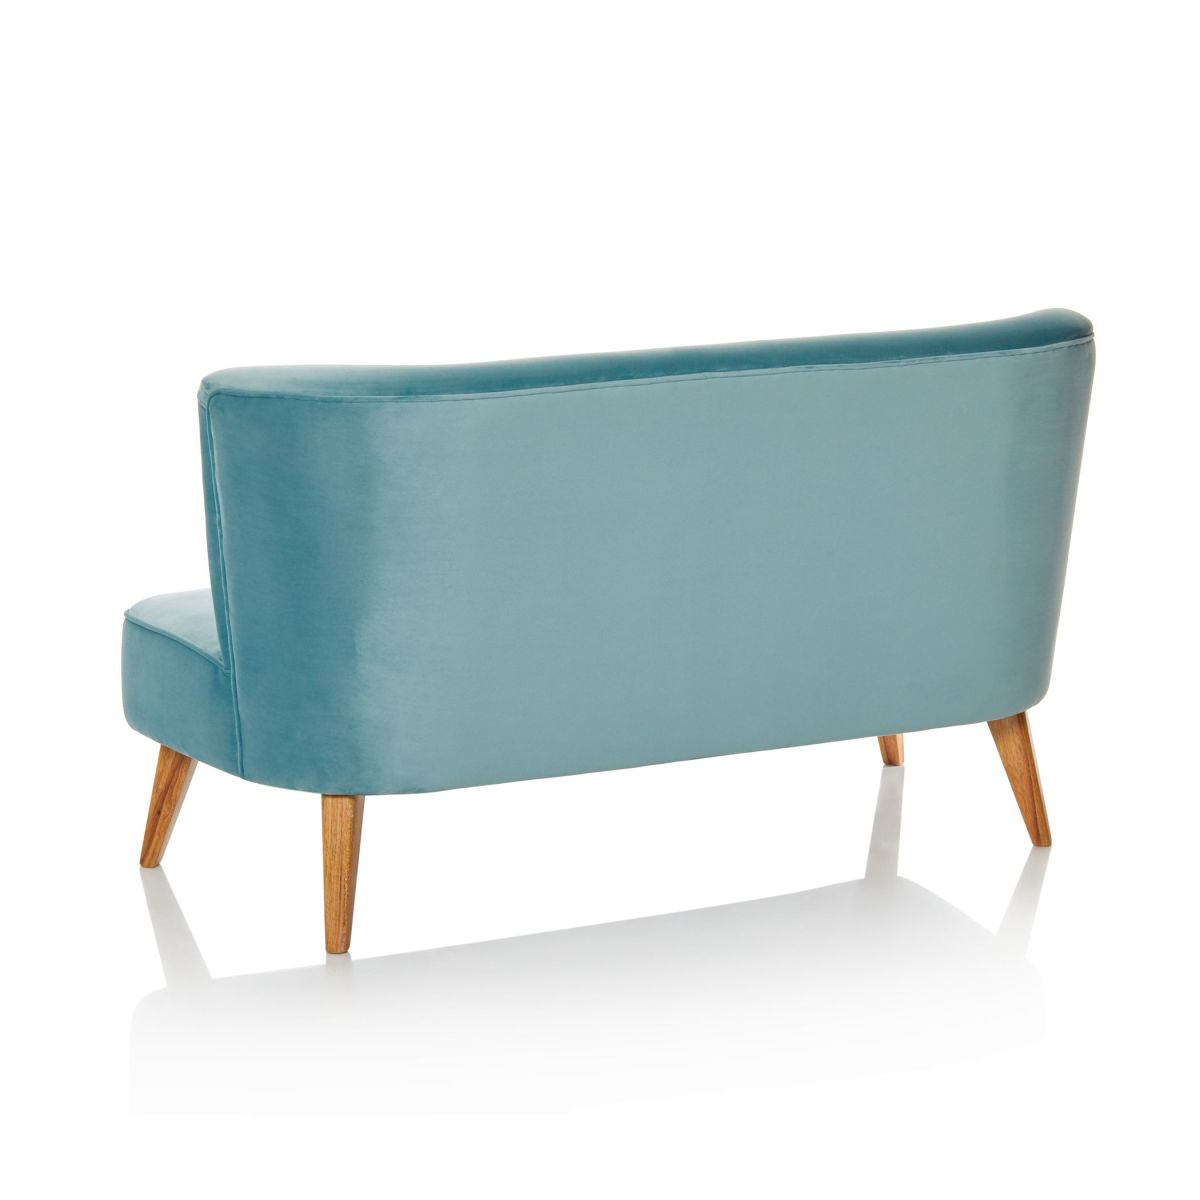 Petition Edward Luvs White Sofa: Vintage Sofa Couch Samtbezug